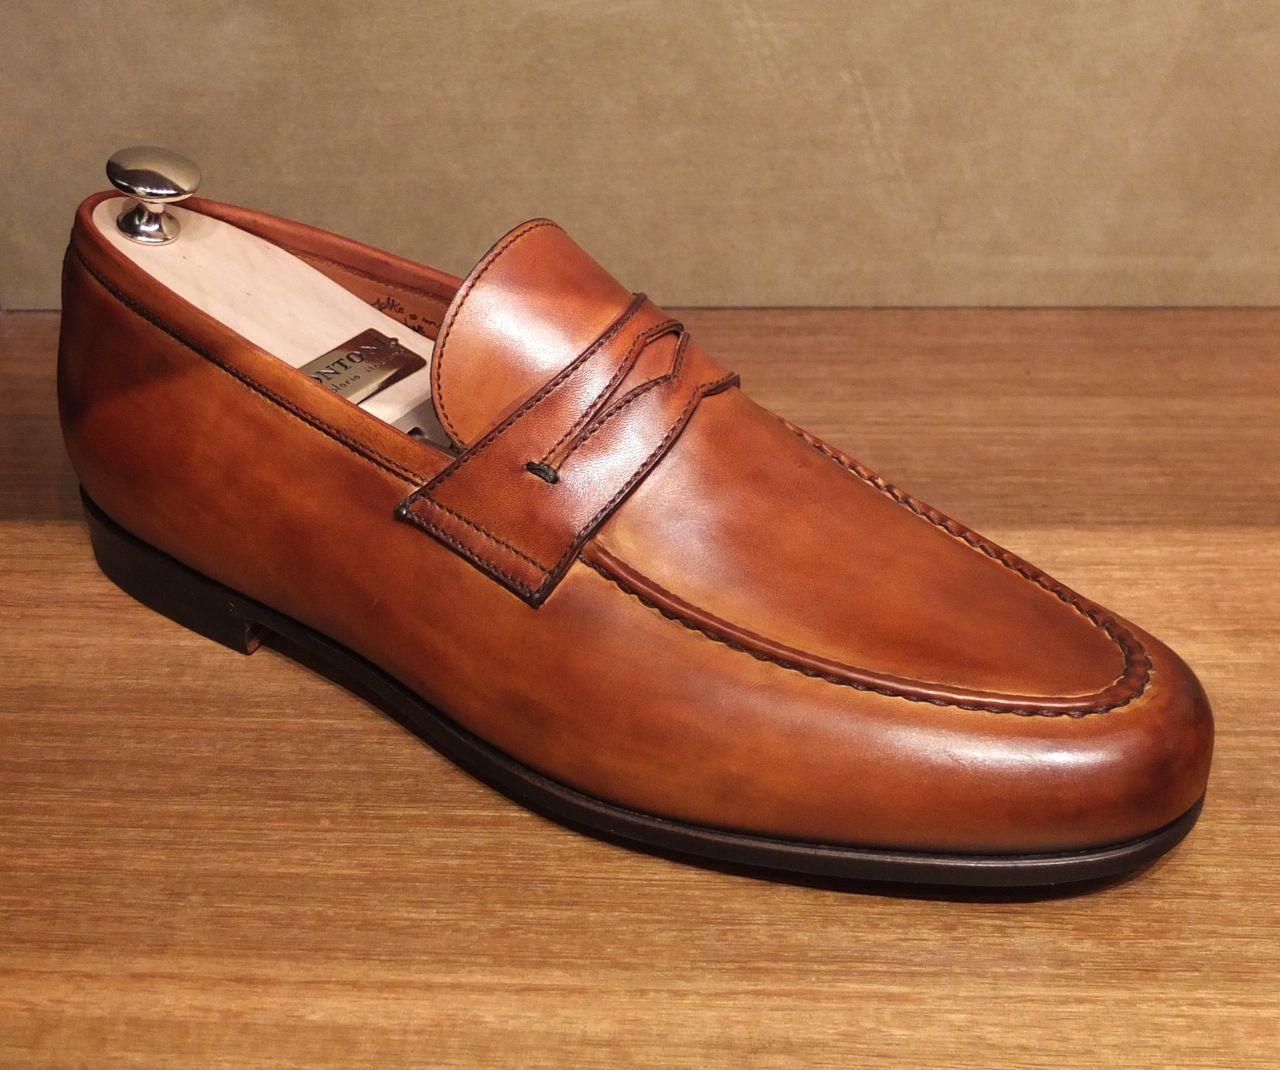 Bontoni loafer. Wilkes Bashford